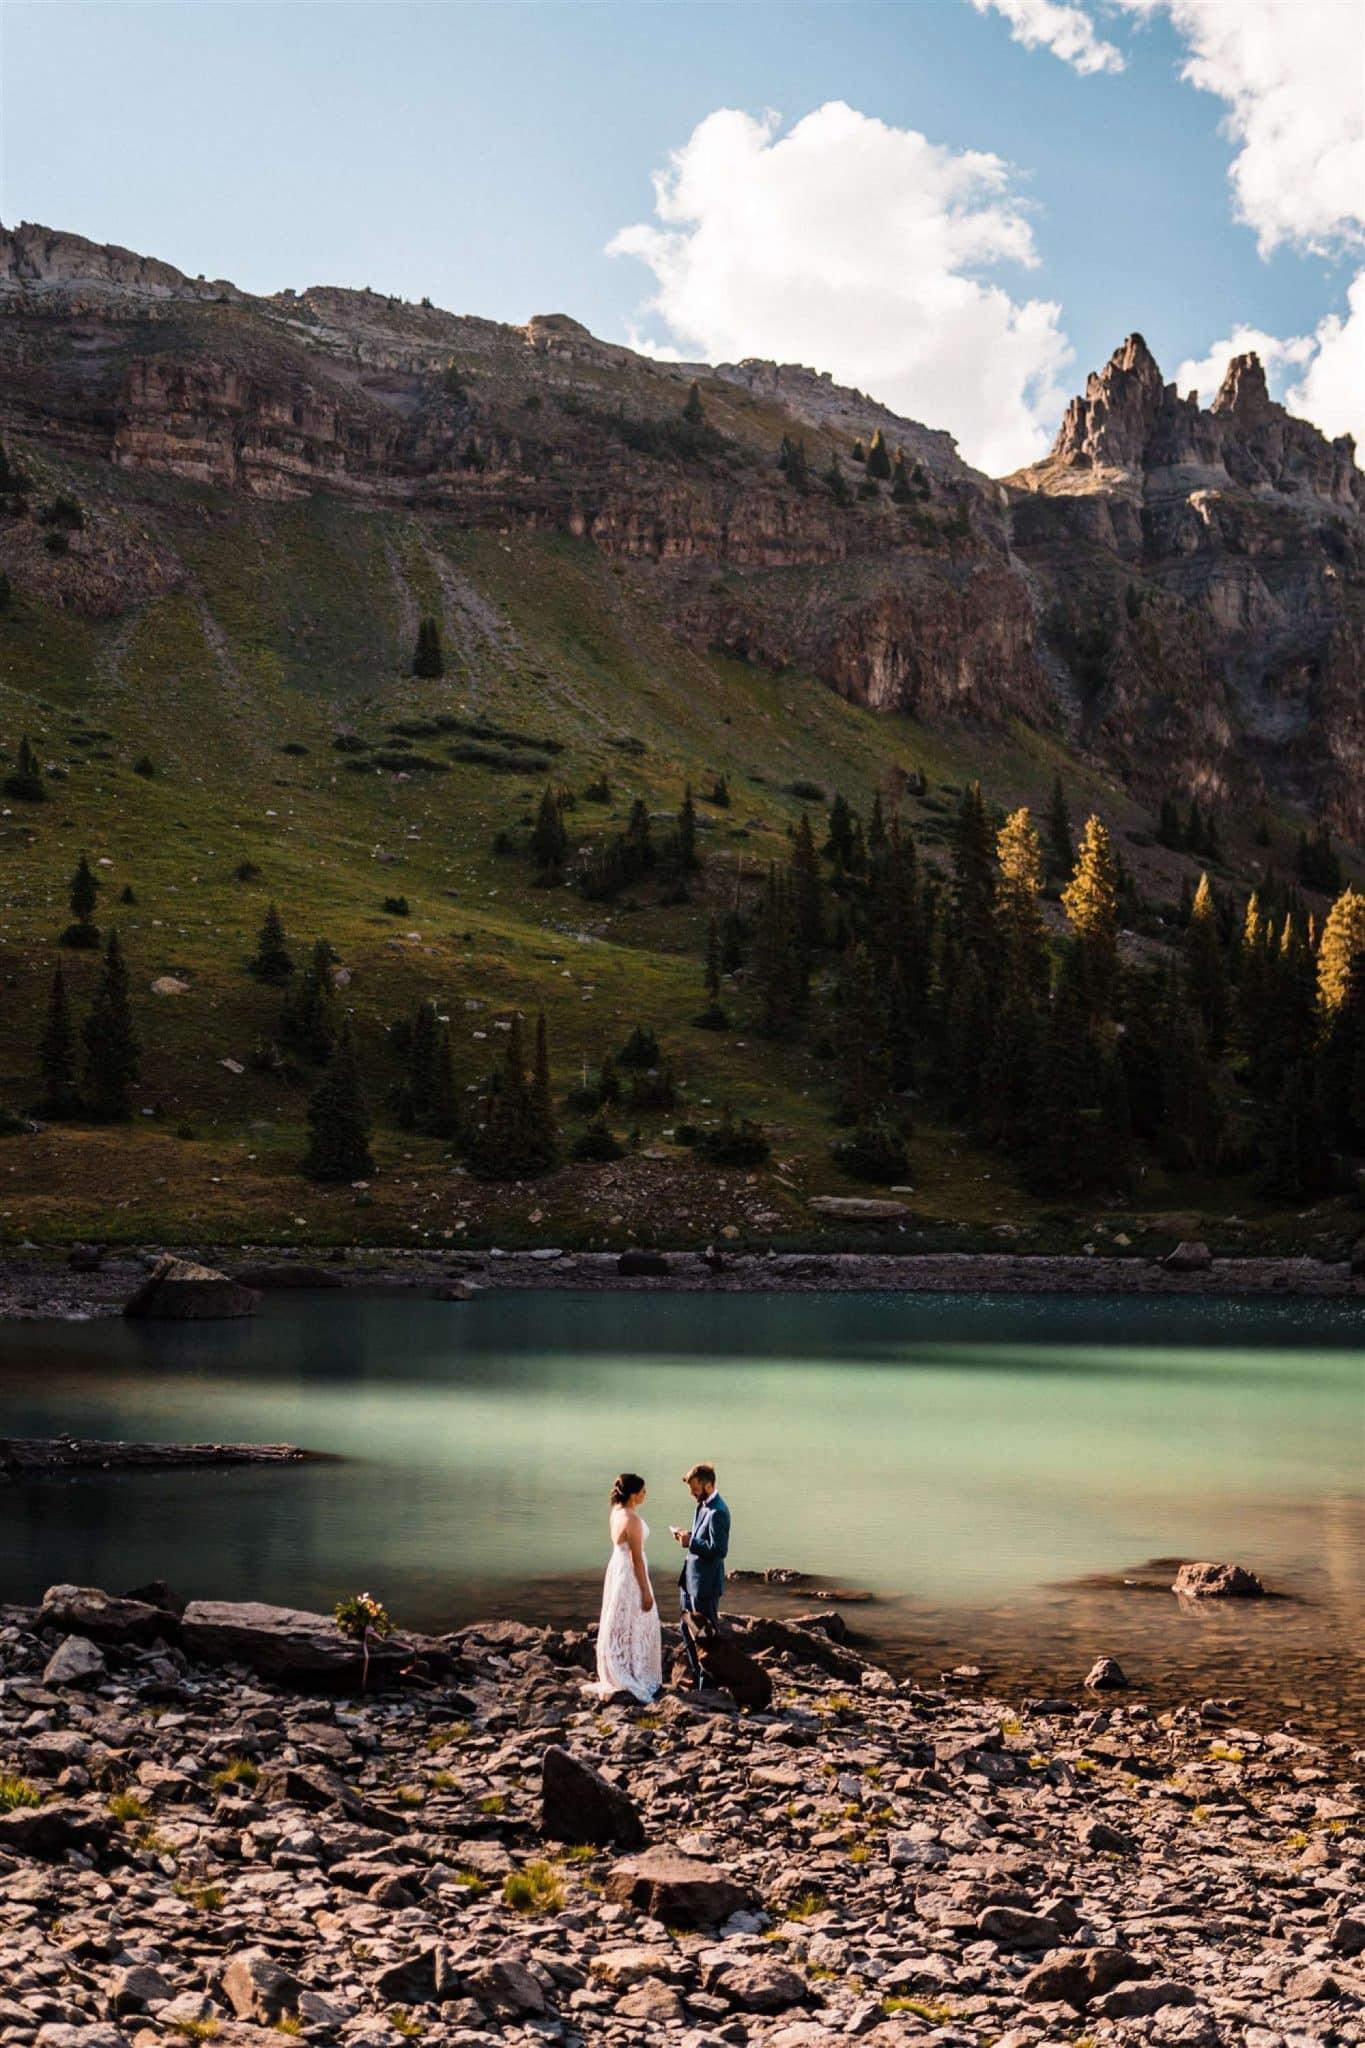 Colorado_Jeeping_Elopement_Emily_Matt_The_Foxes_Photography_0031.jpg